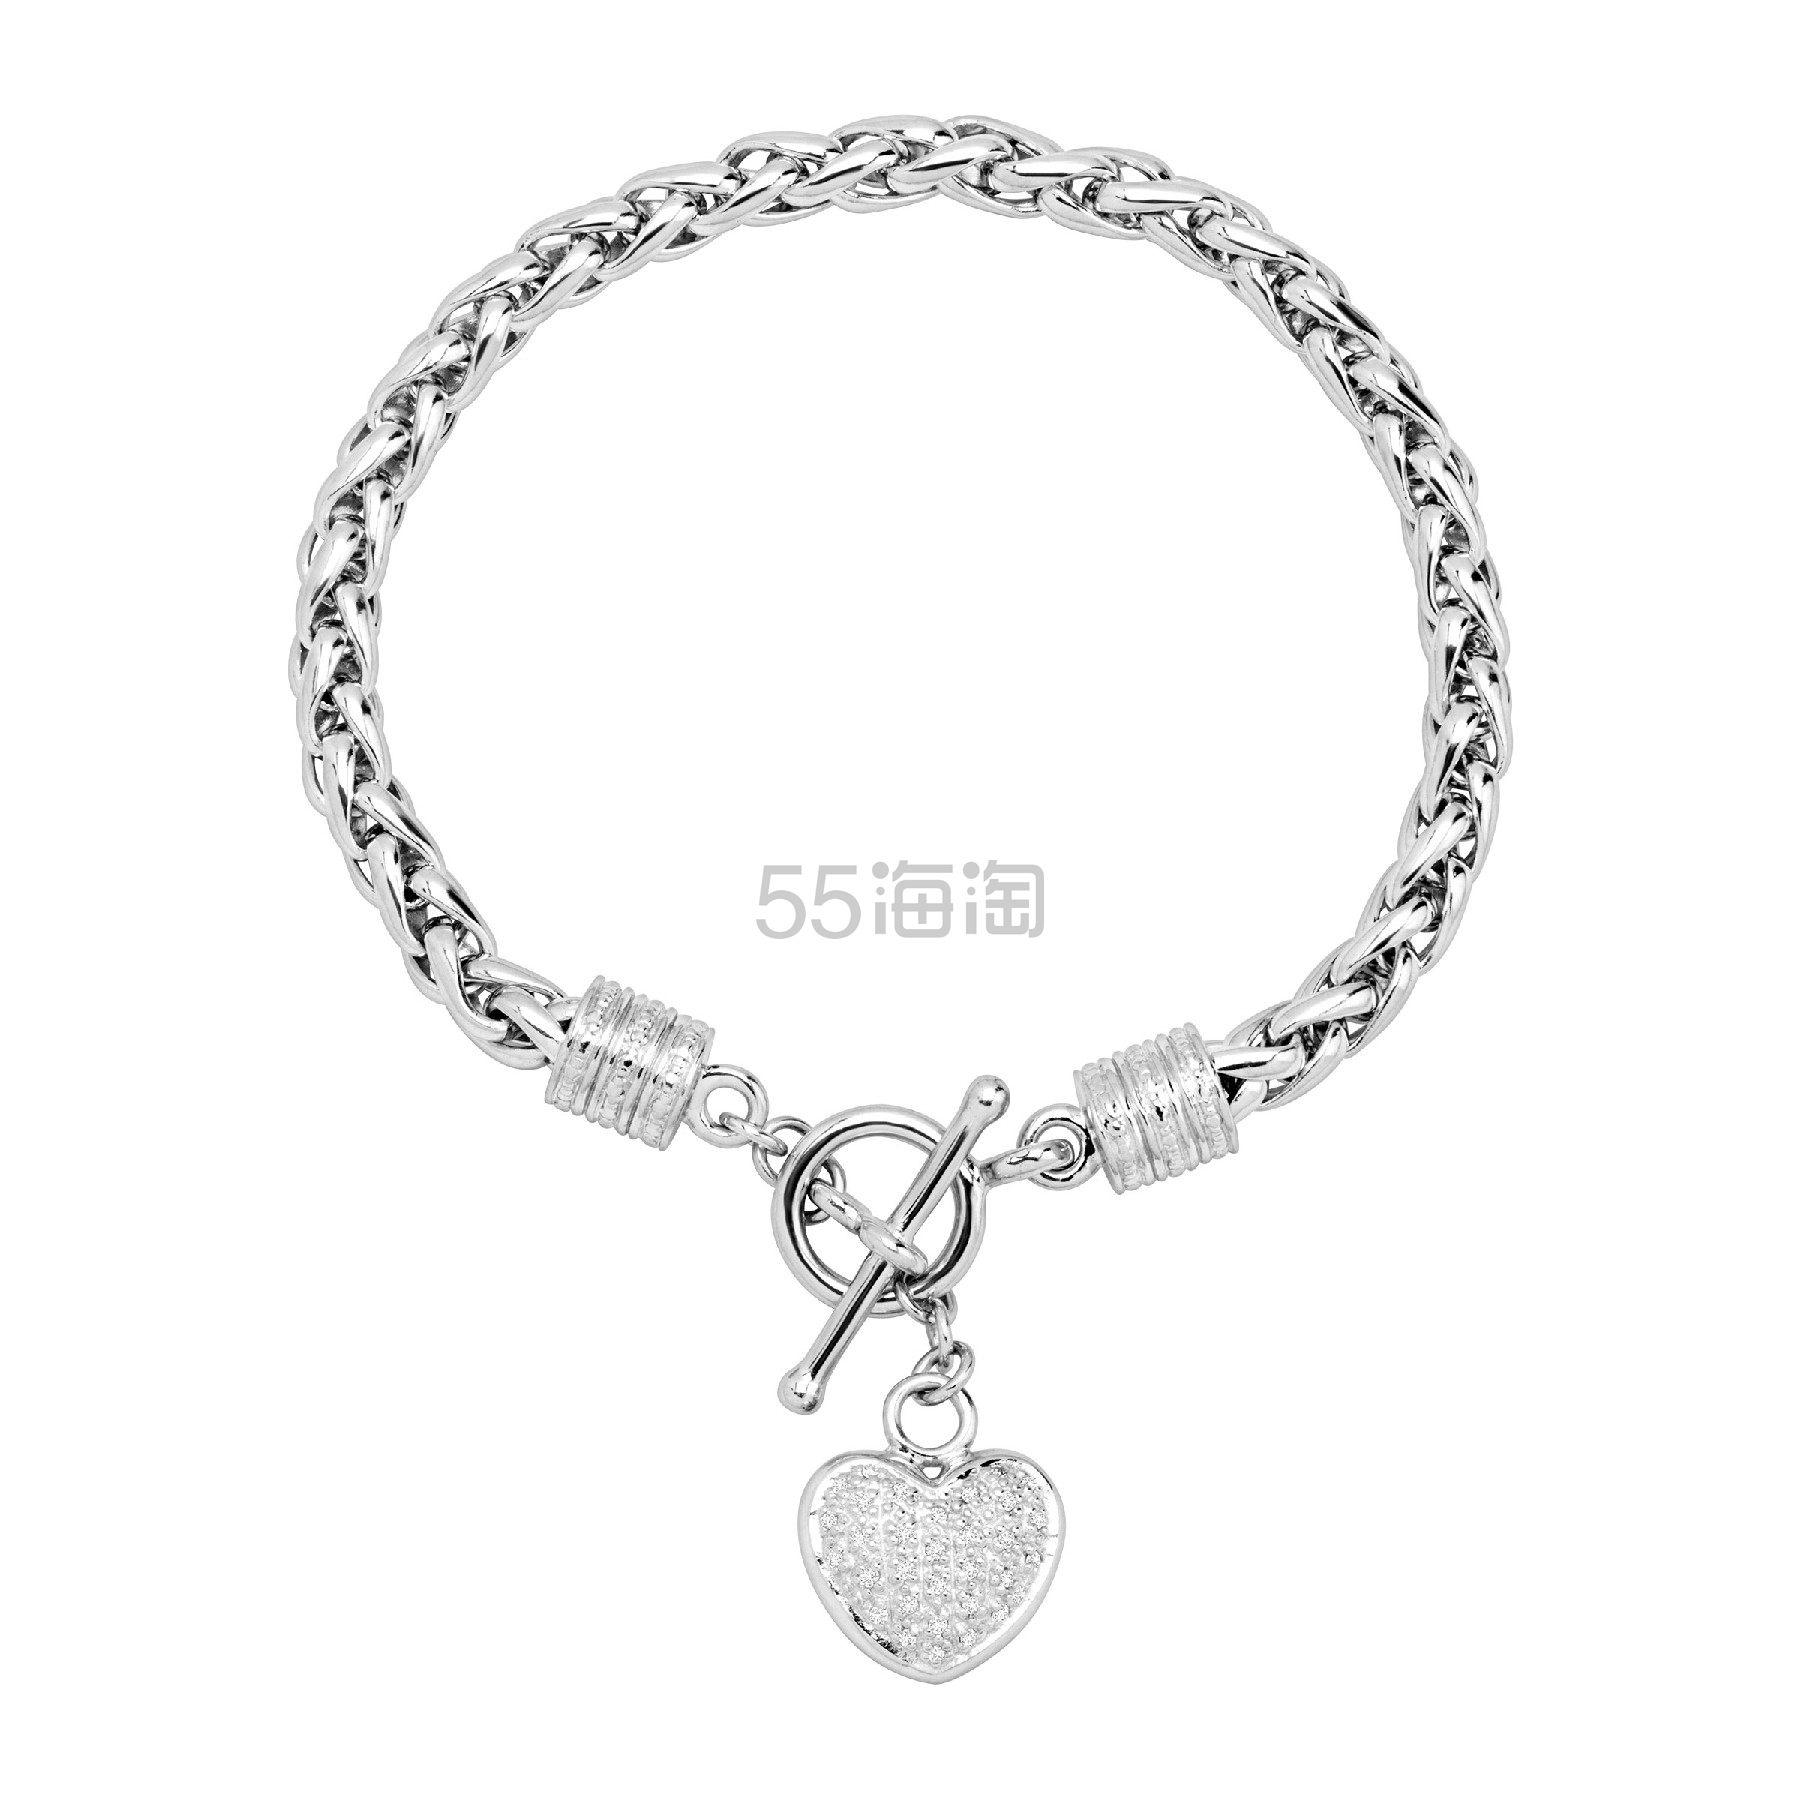 FINECRAFT 1/8 CT 钻石心形银手链 9(约828元) - 海淘优惠海淘折扣|55海淘网